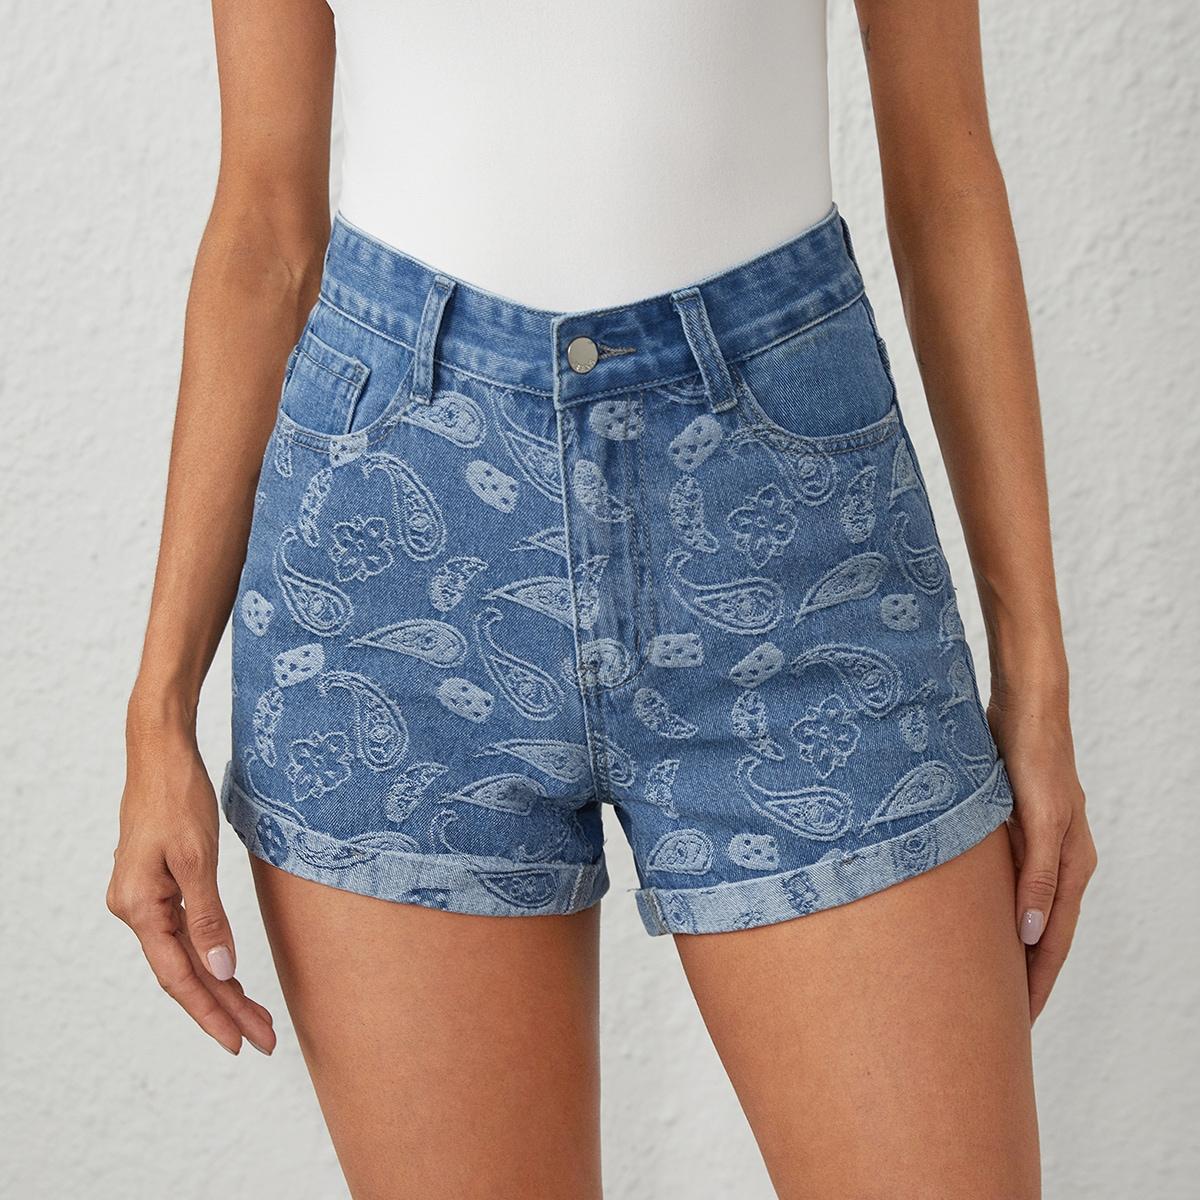 SHEIN Casual Paisley Denim shorts